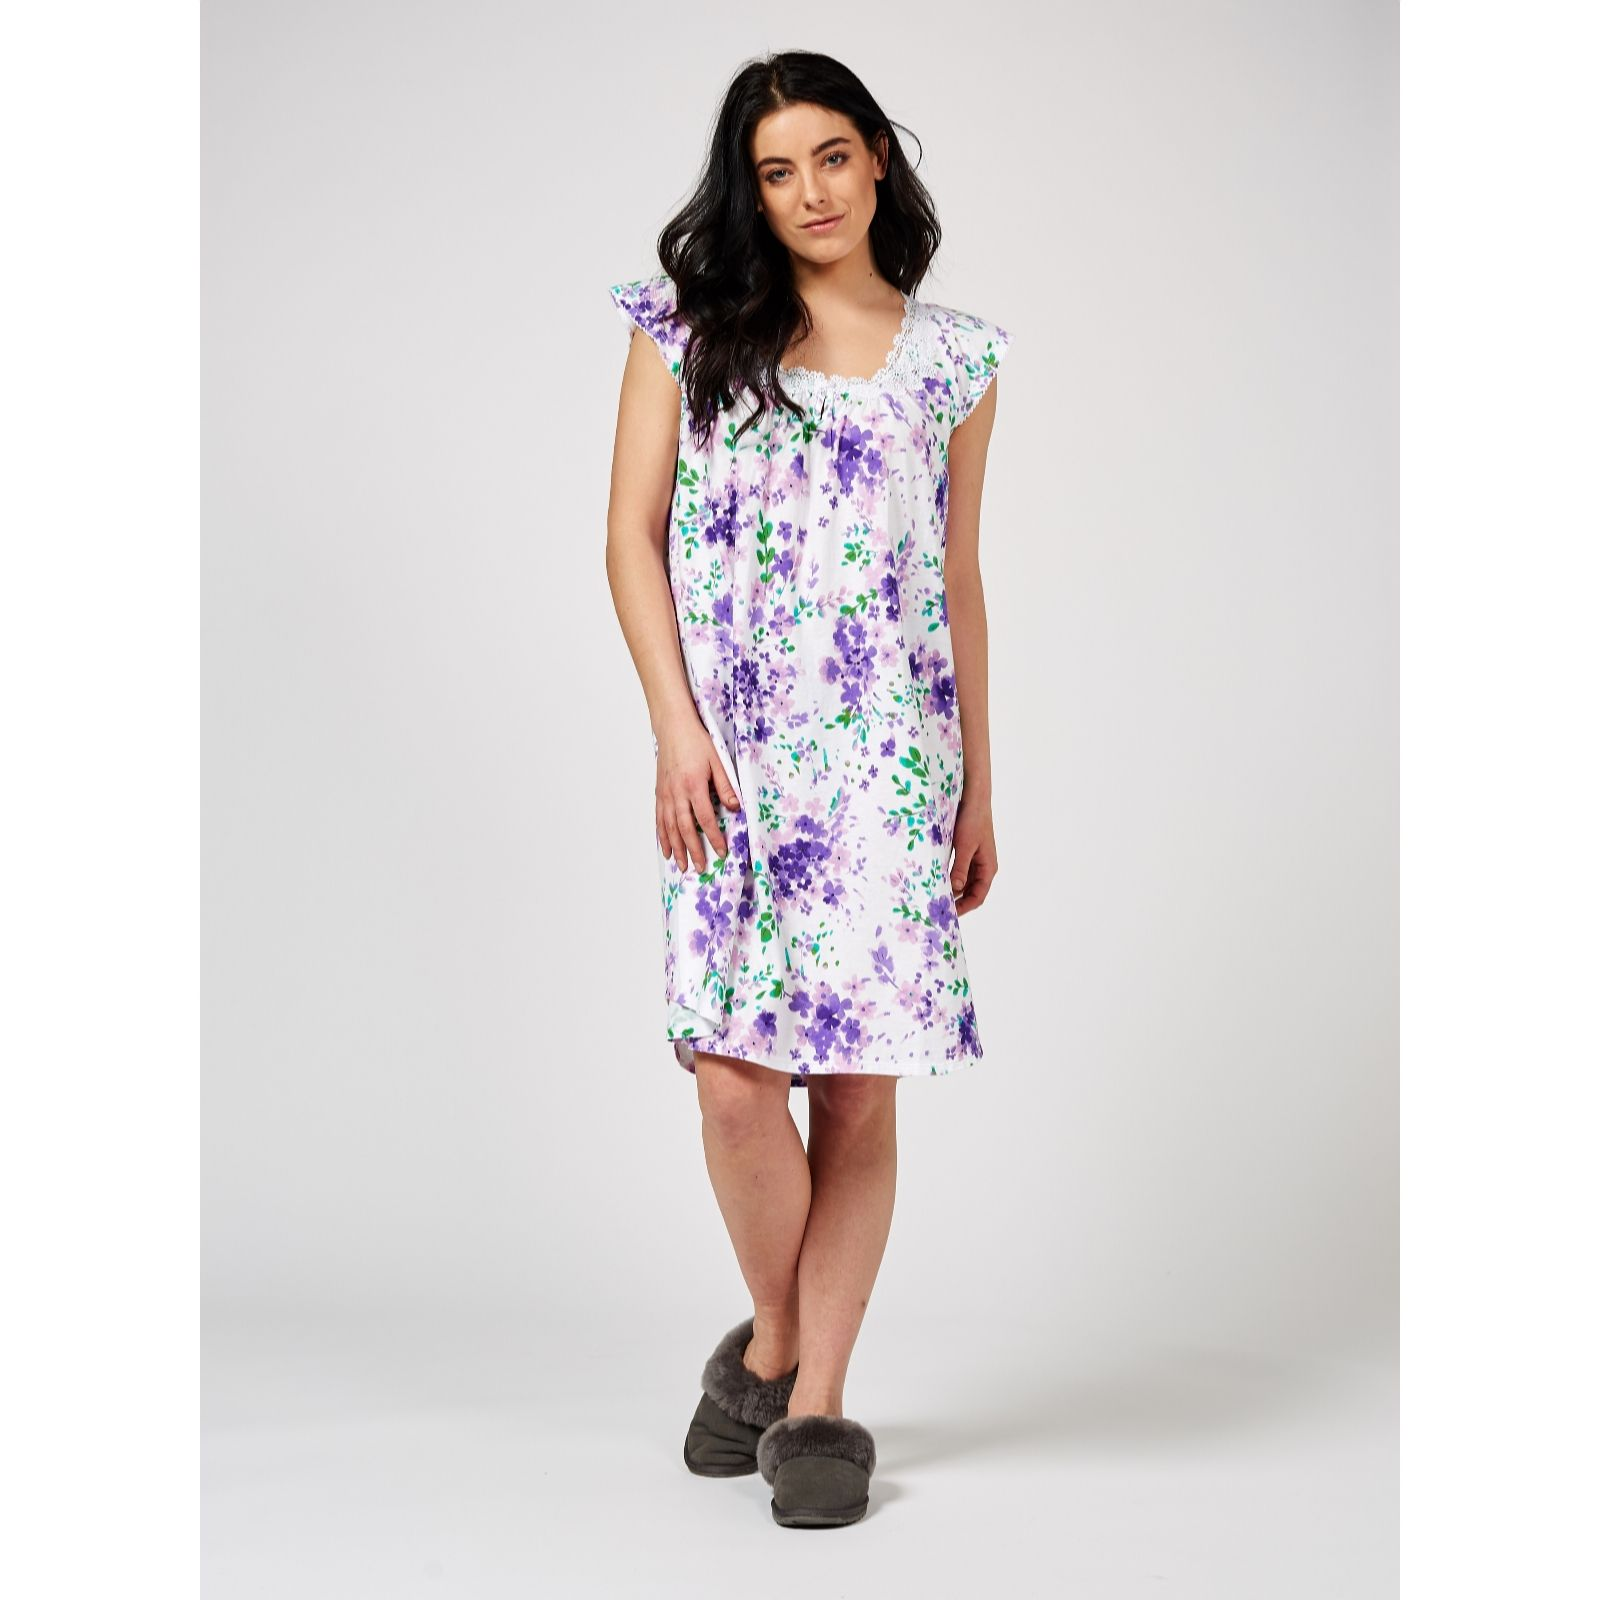 9bc5455d1a Carole Hochman Cotton Jersey Floral Print Lace Trim Short Nightdress - QVC  UK